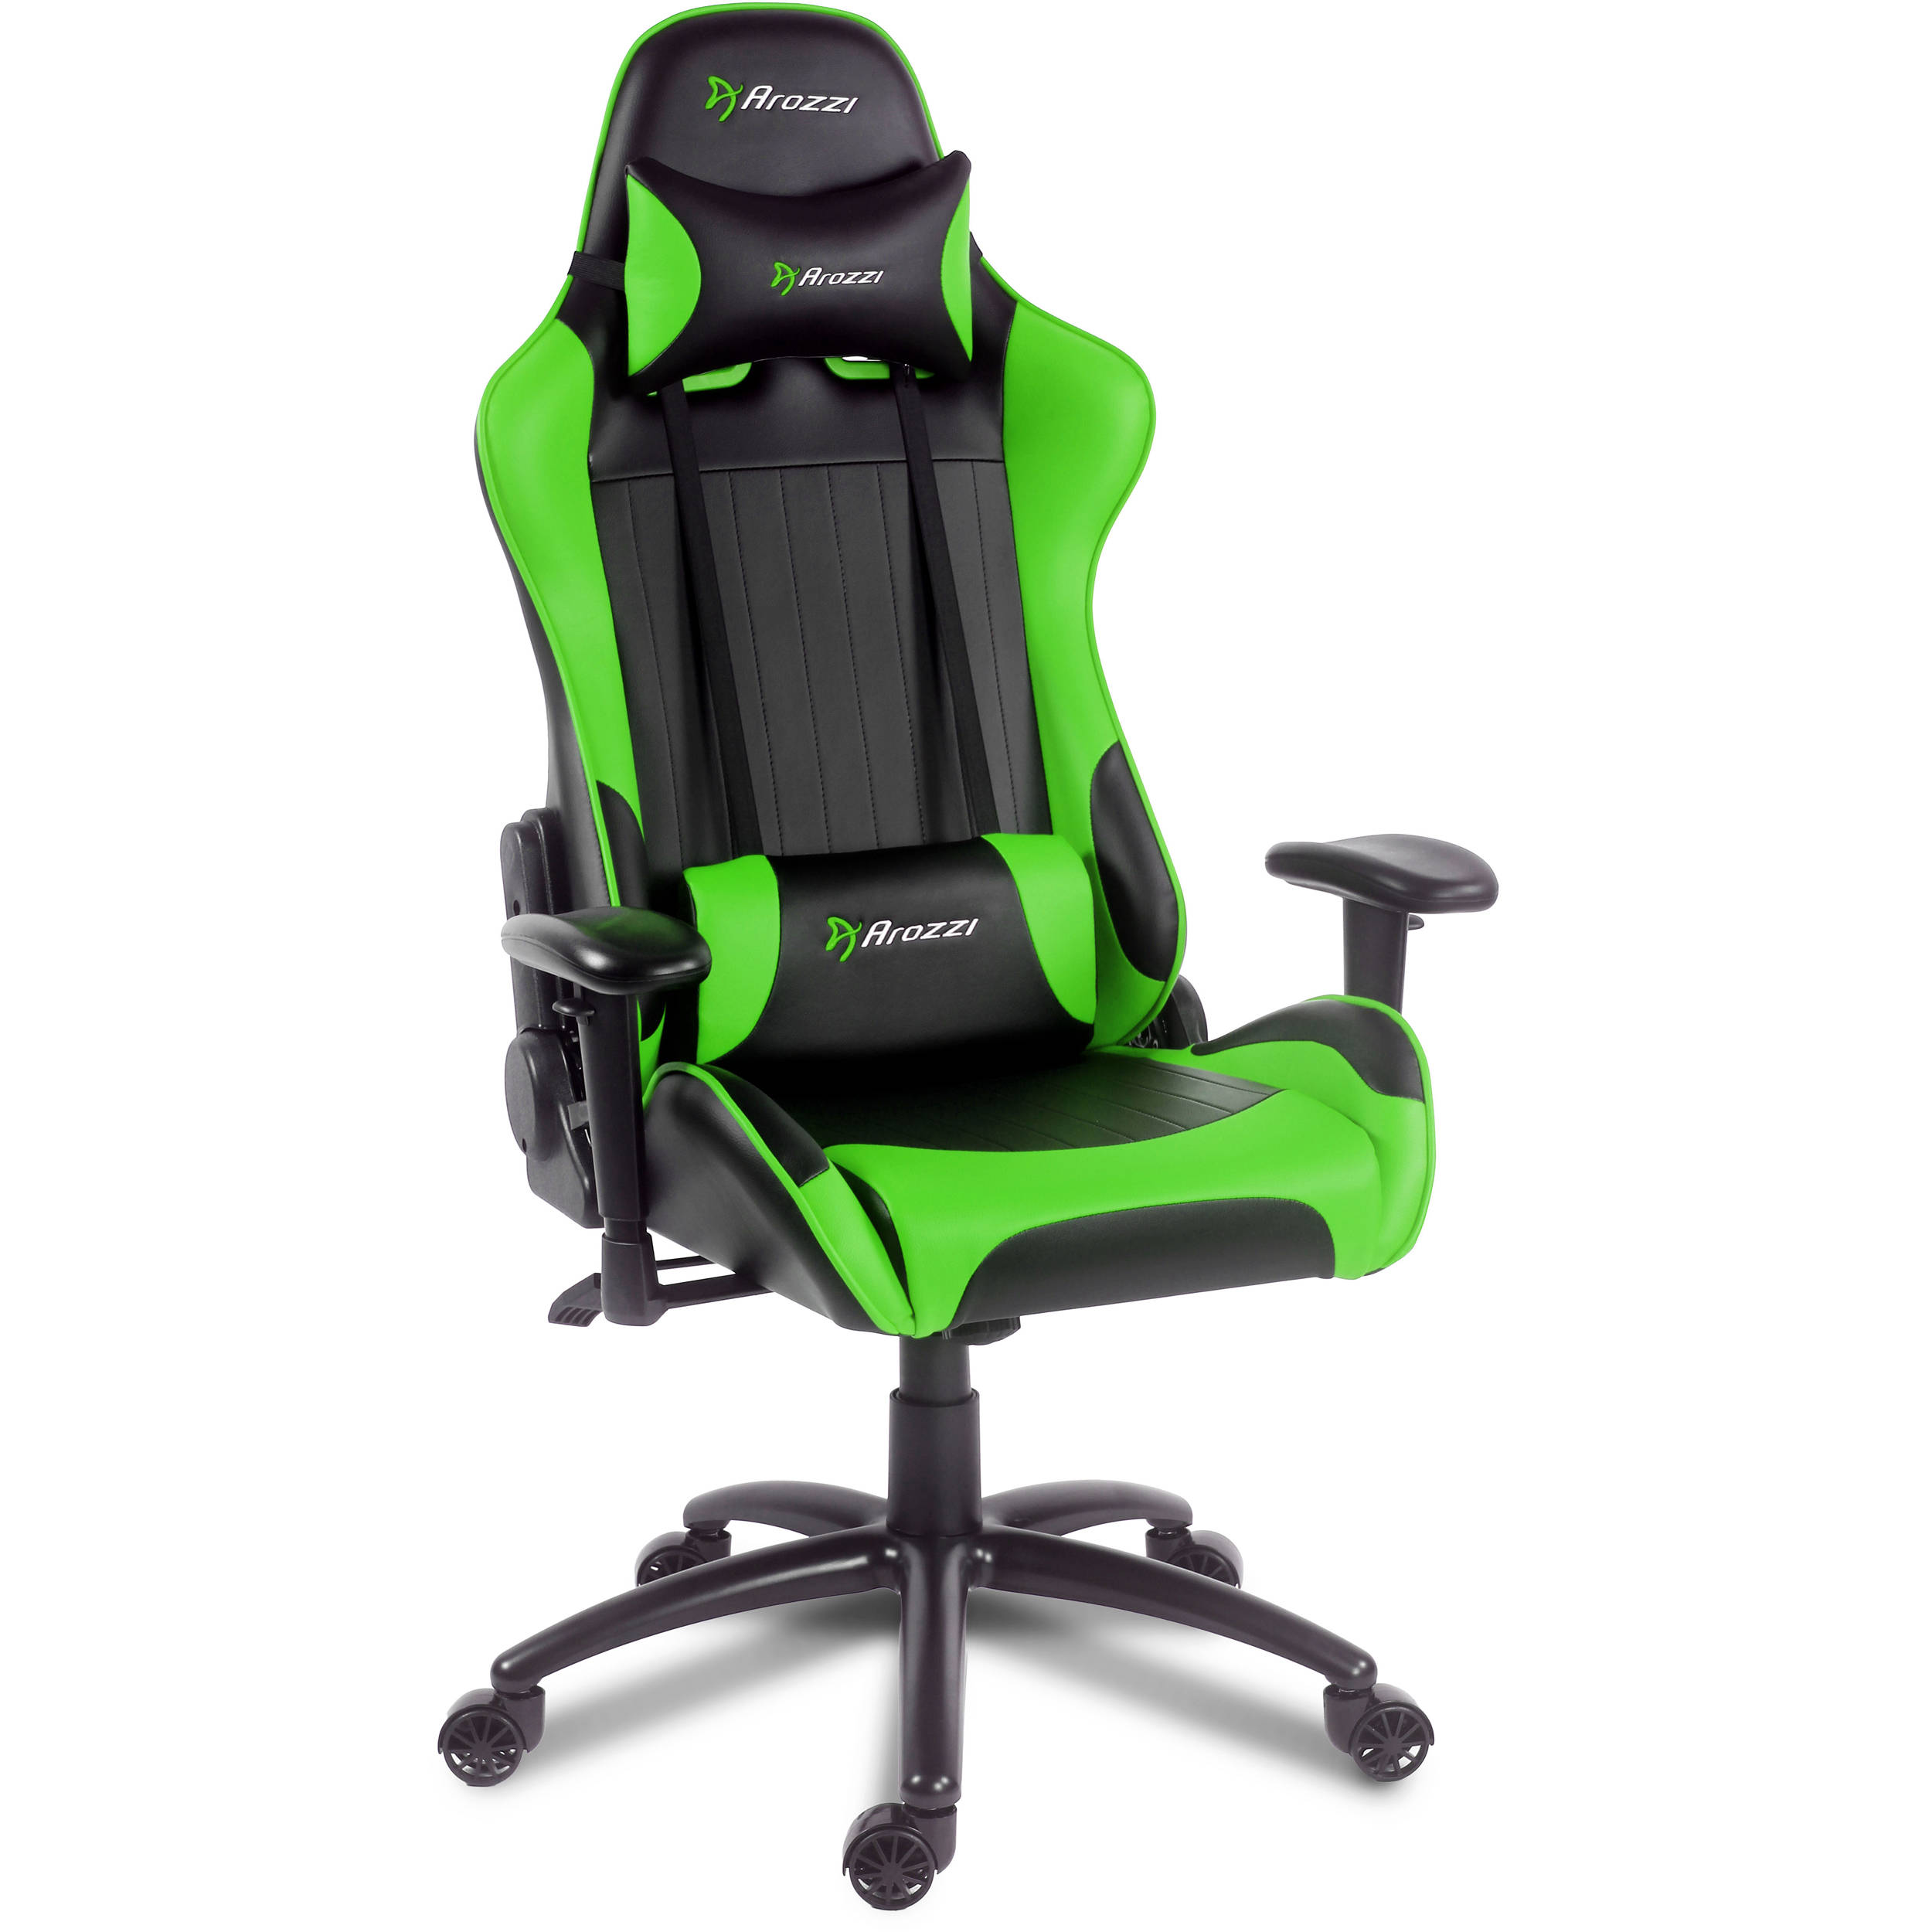 Arozzi Verona Gaming Chair (Green) VERONA-GN B&H Photo Video